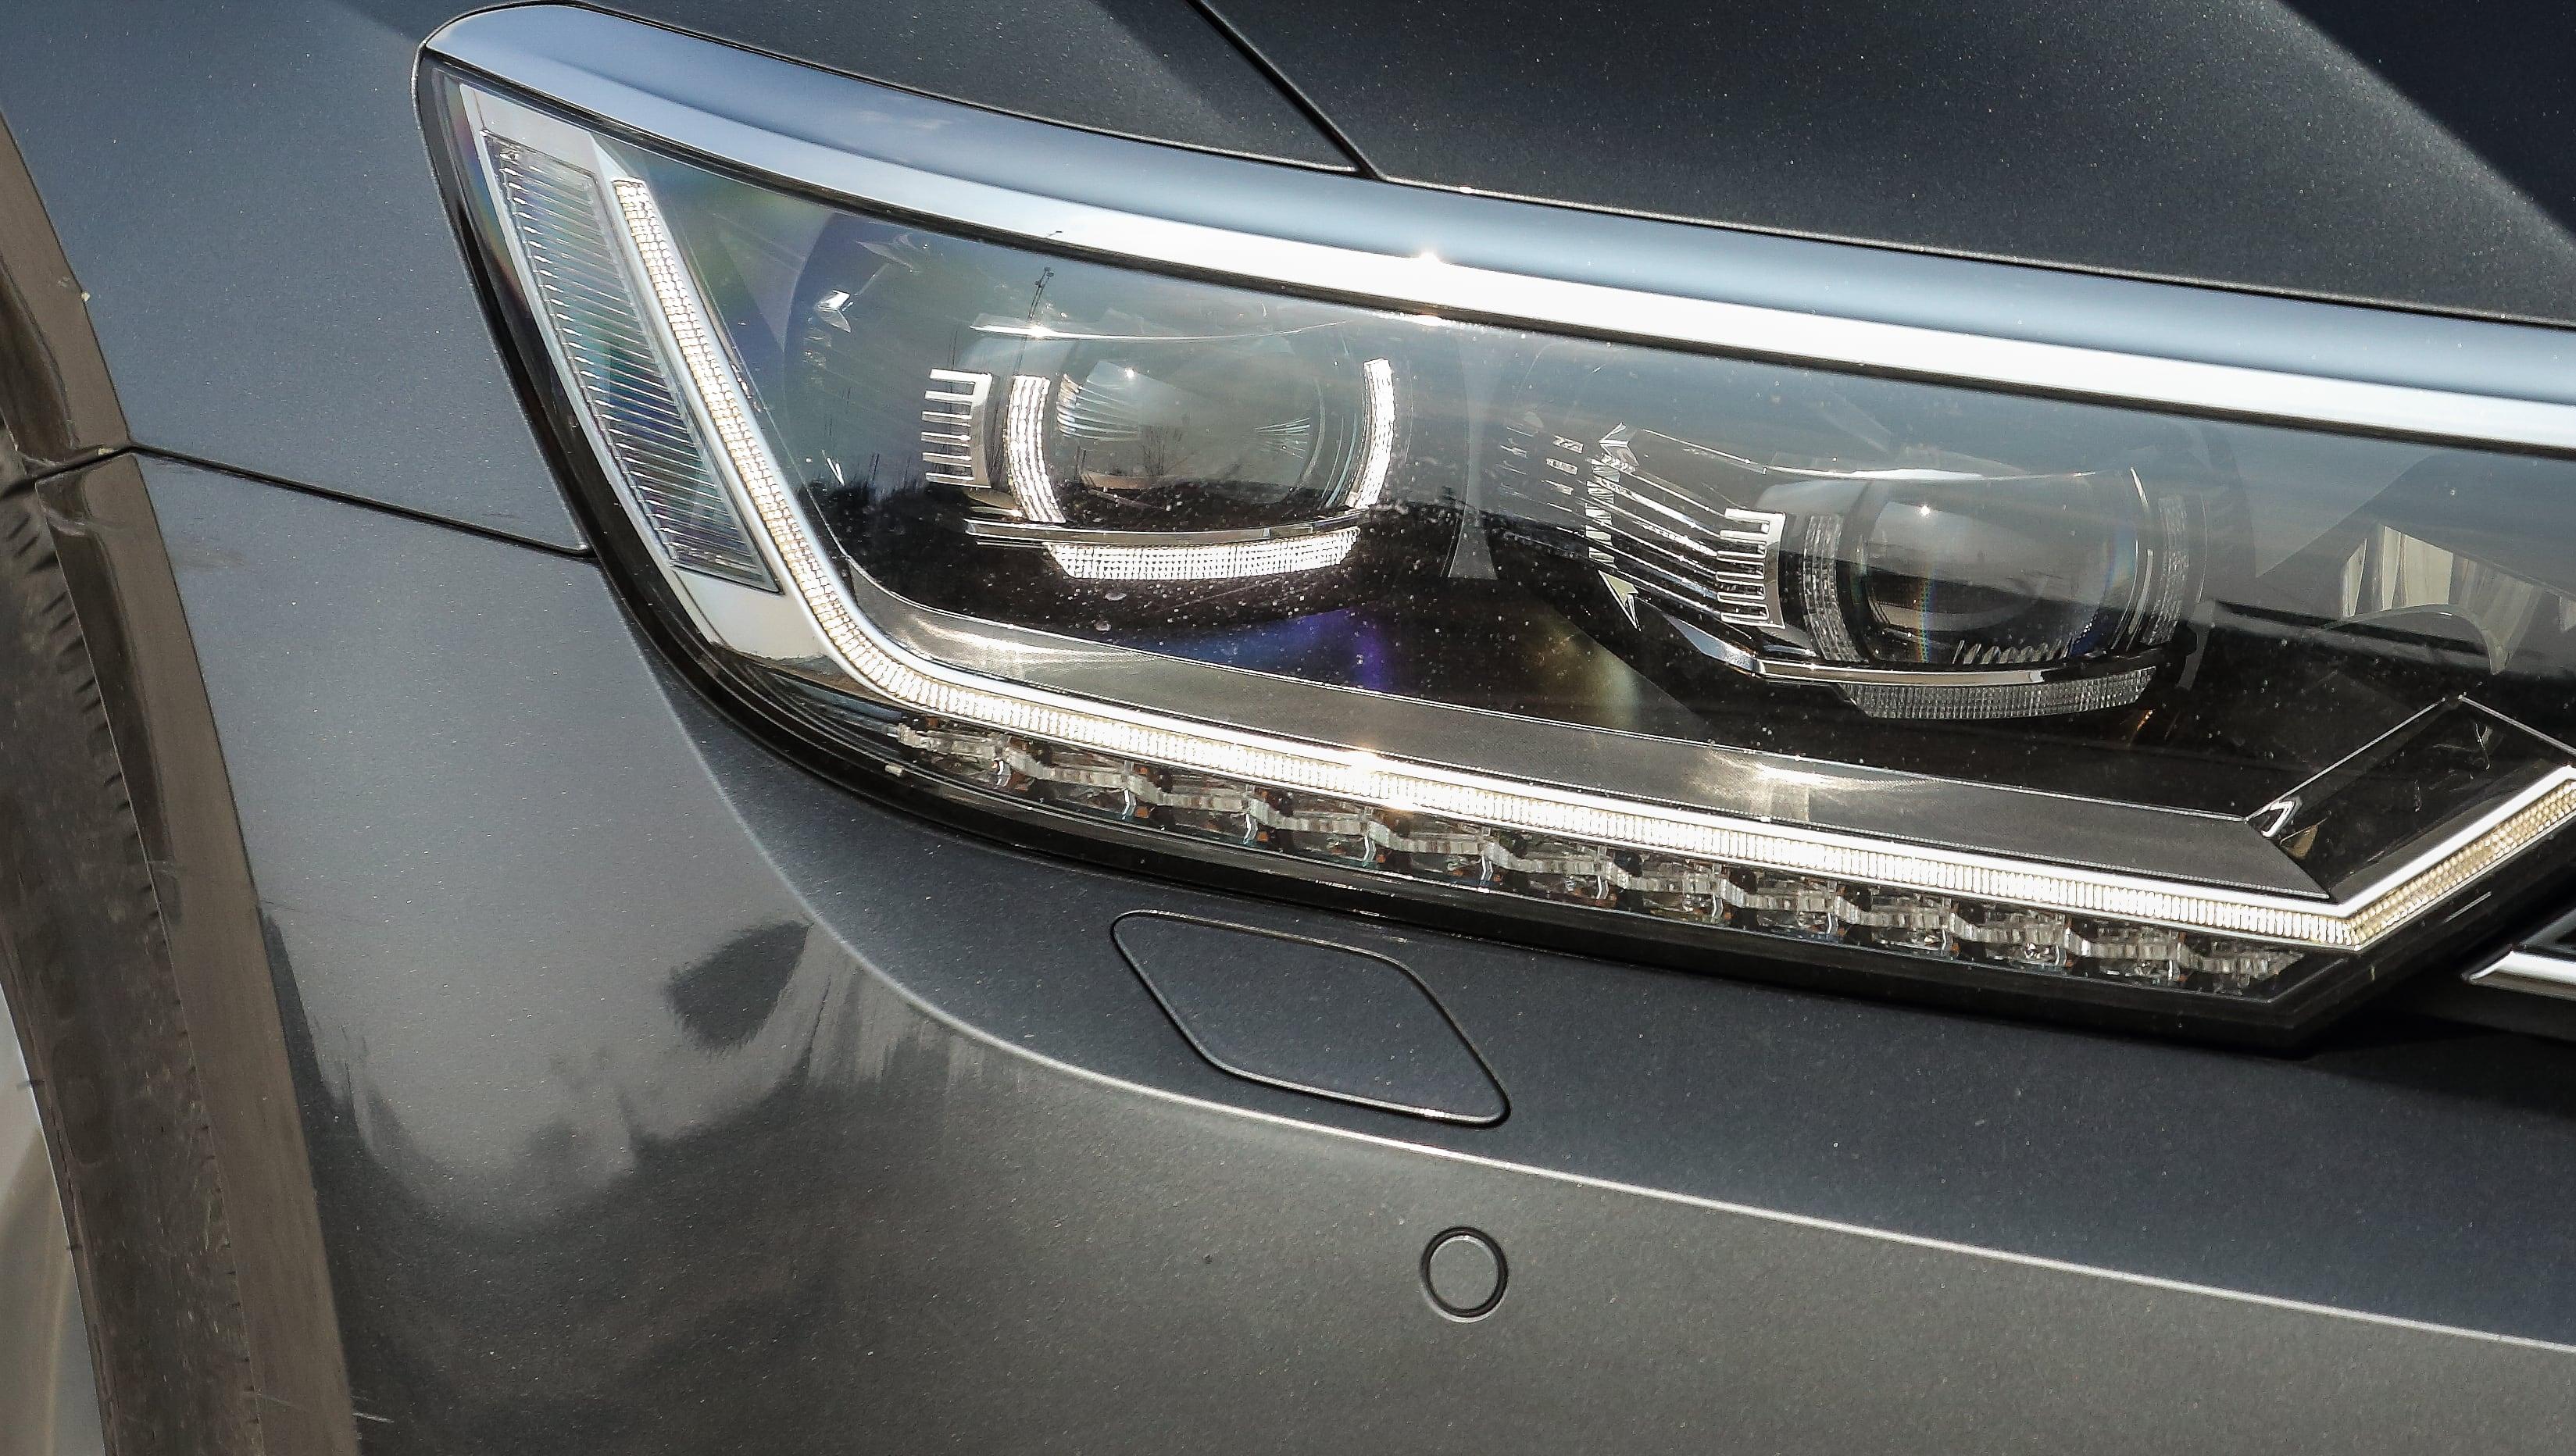 Volkswagen Passat (B8) 1.8 TSI reflektor ipokrywy spryskiwaczy